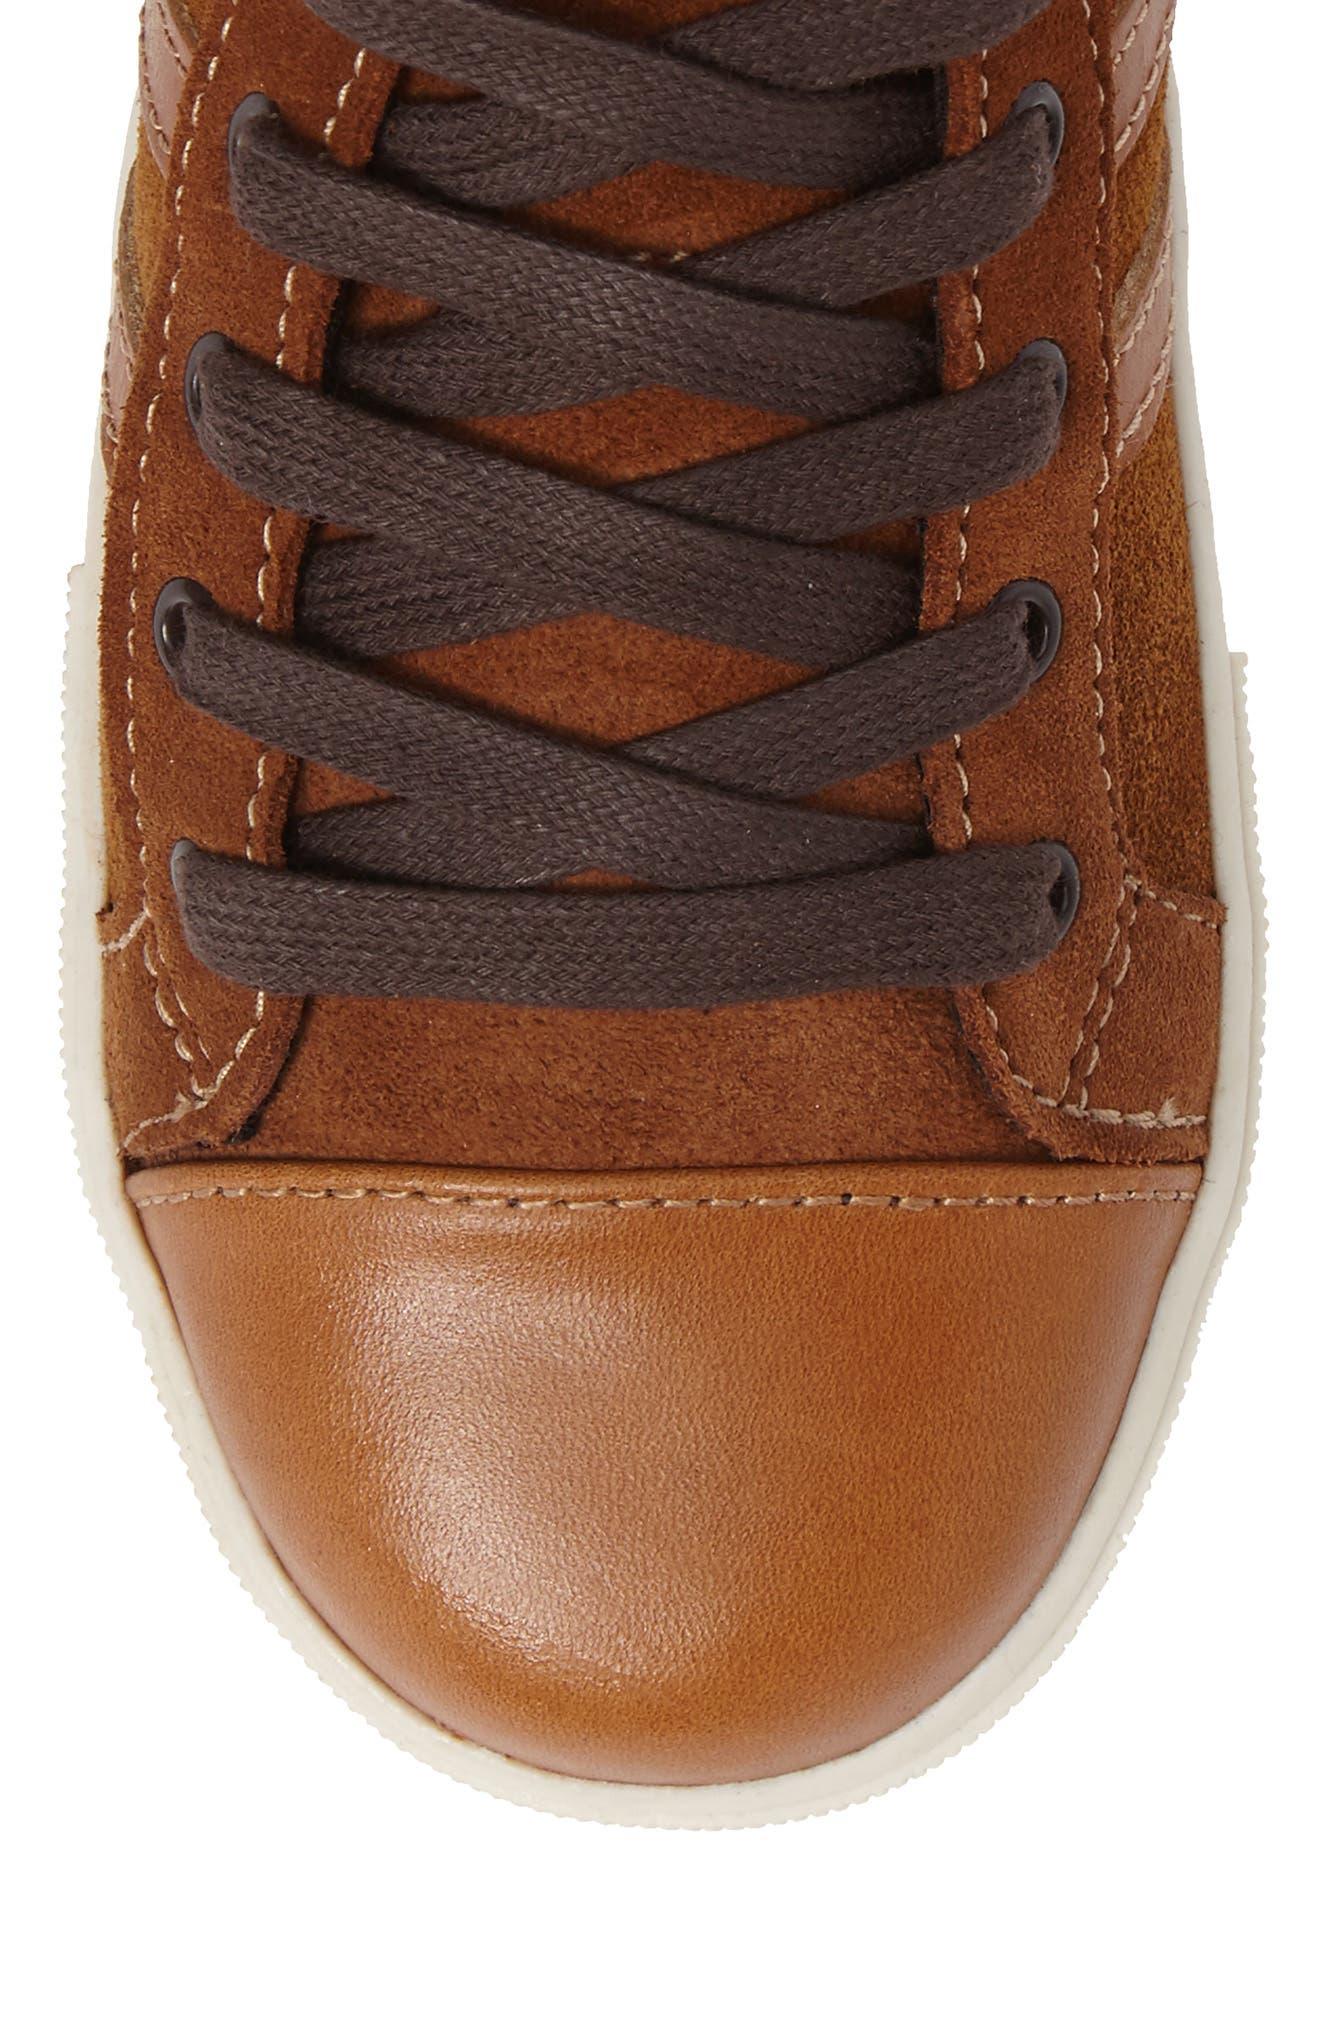 Jay Top High-Top Zip Sneaker,                             Alternate thumbnail 5, color,                             205